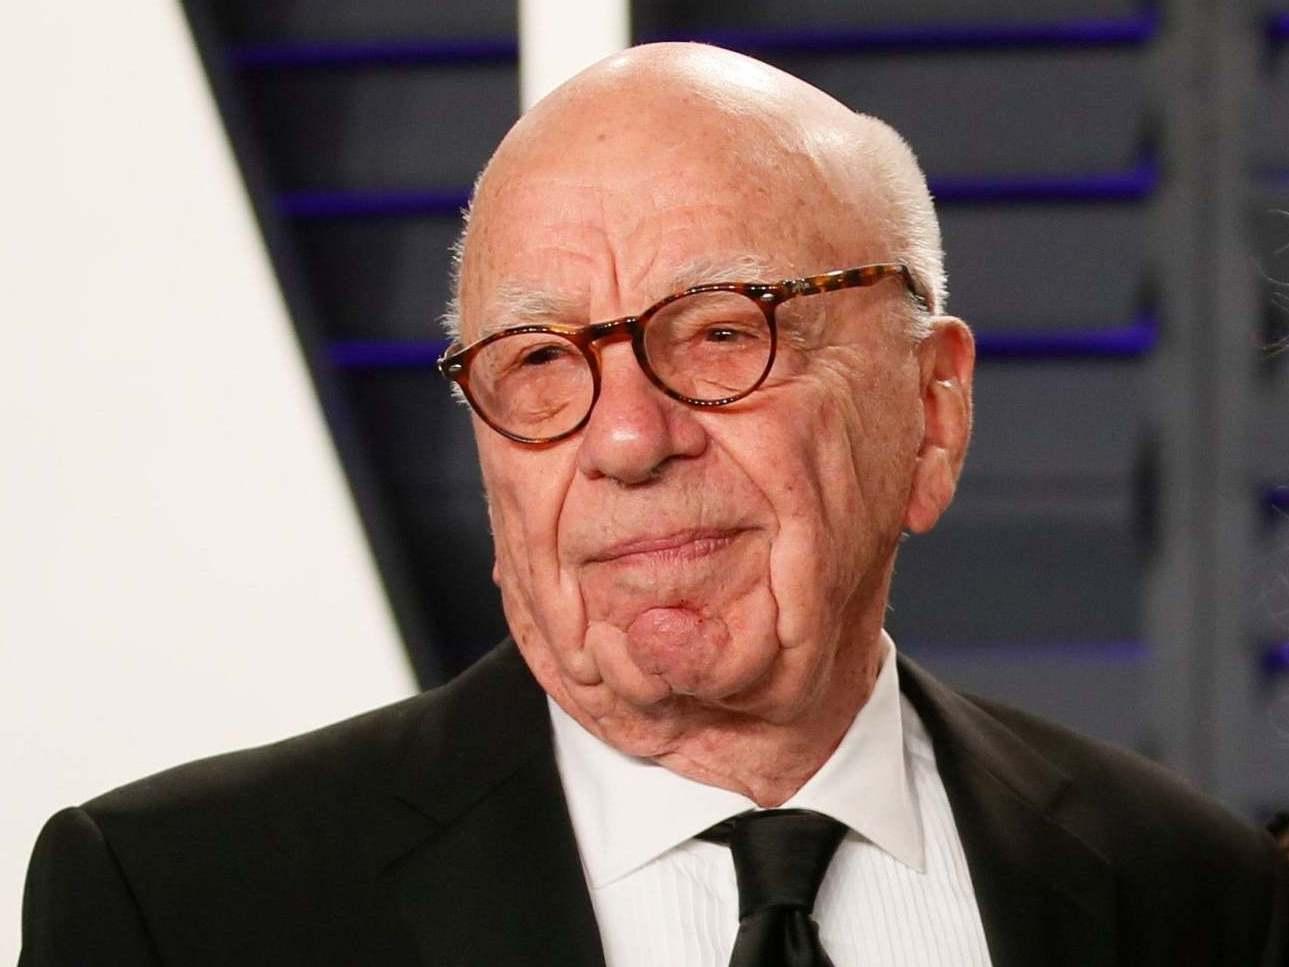 Rupert Murdoch to launch BBC Radio 4 rival as corporation suffers funding cuts